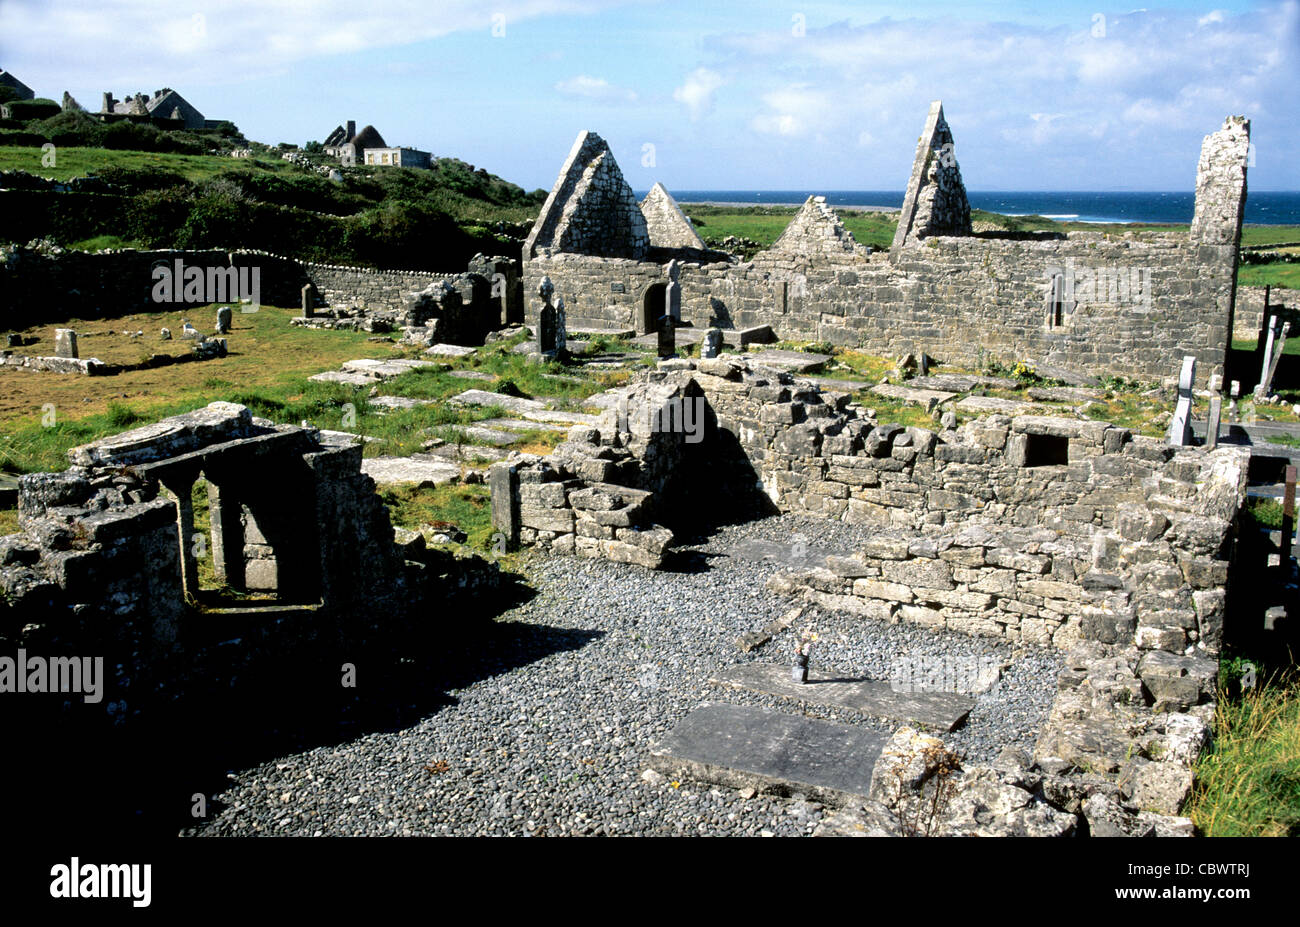 Le Sette Chiese su INISH (Fine) Mor - Isole Aran - Galway - IRLANDA Immagini Stock